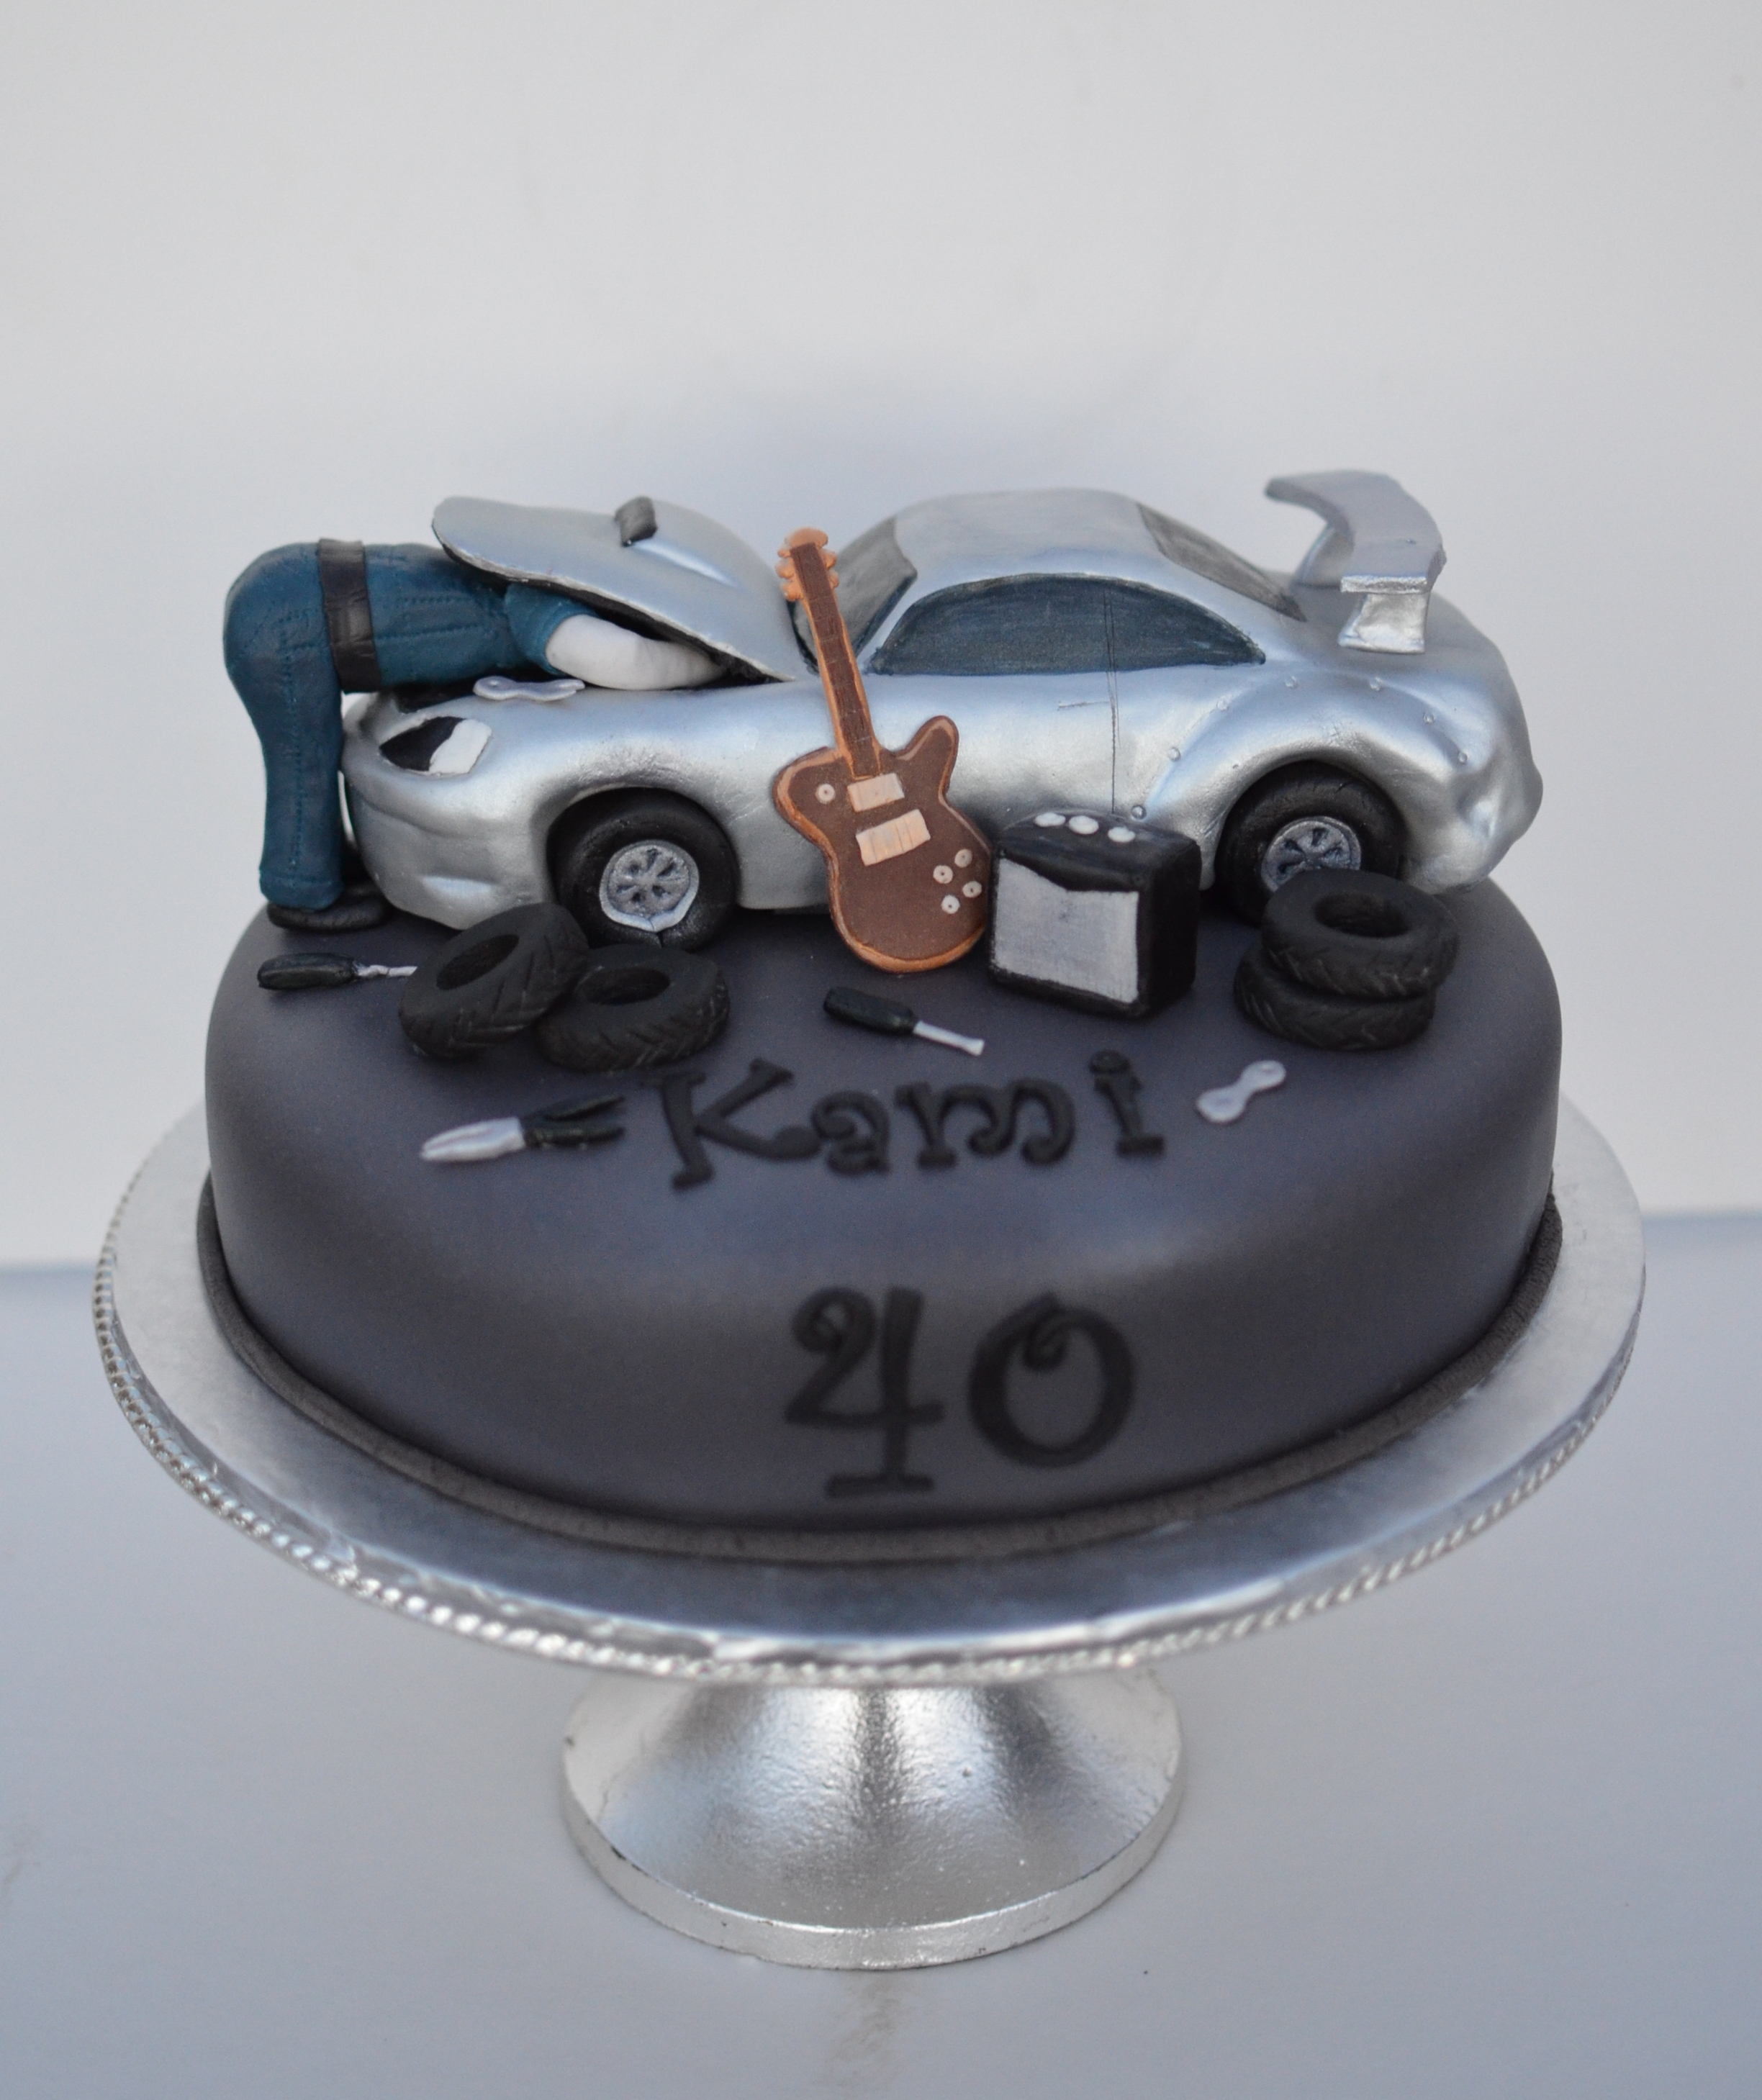 Car and hobby cake